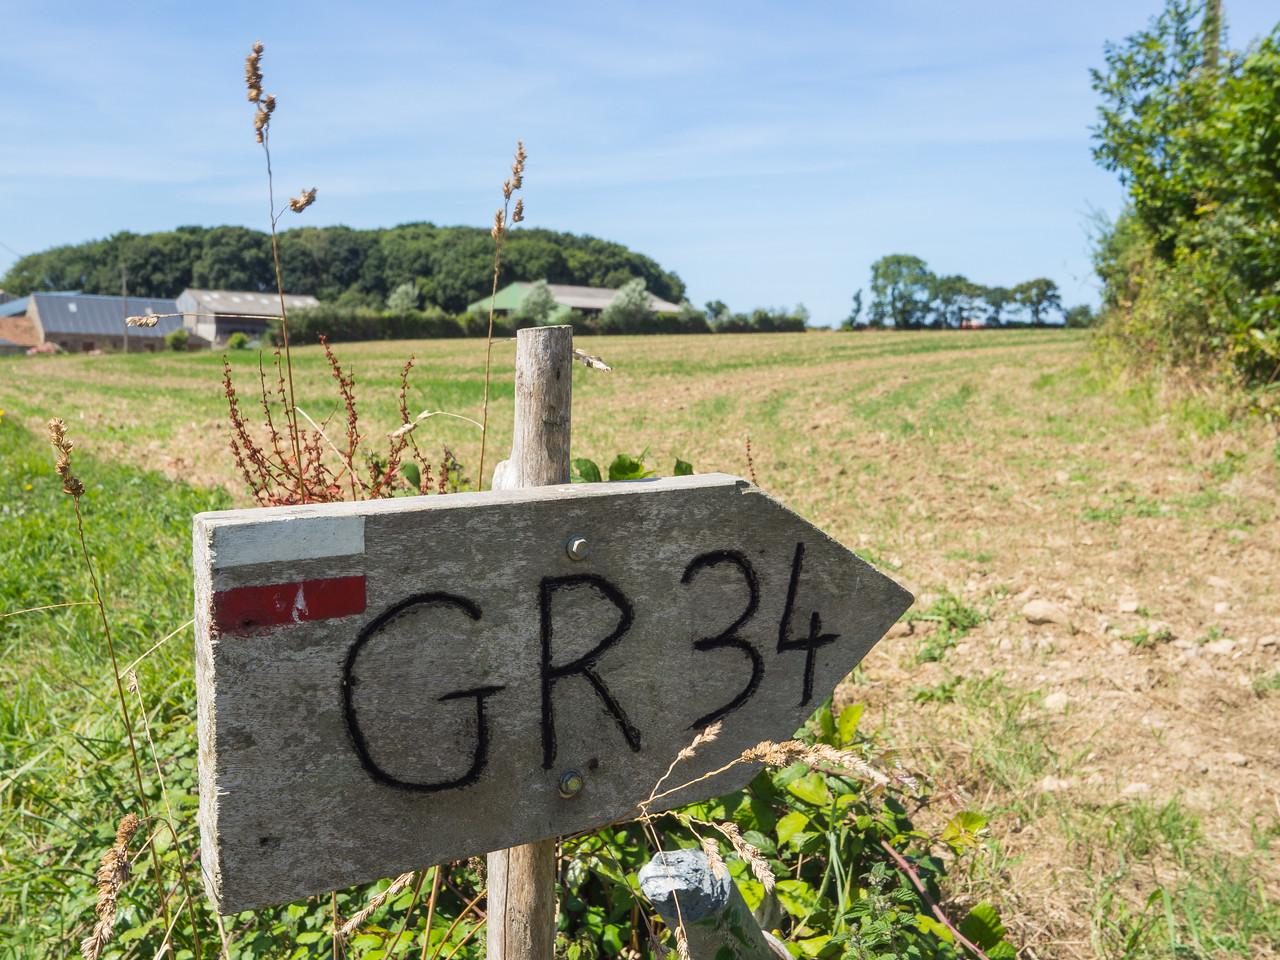 Inland from Saint-Michel-en-Grève